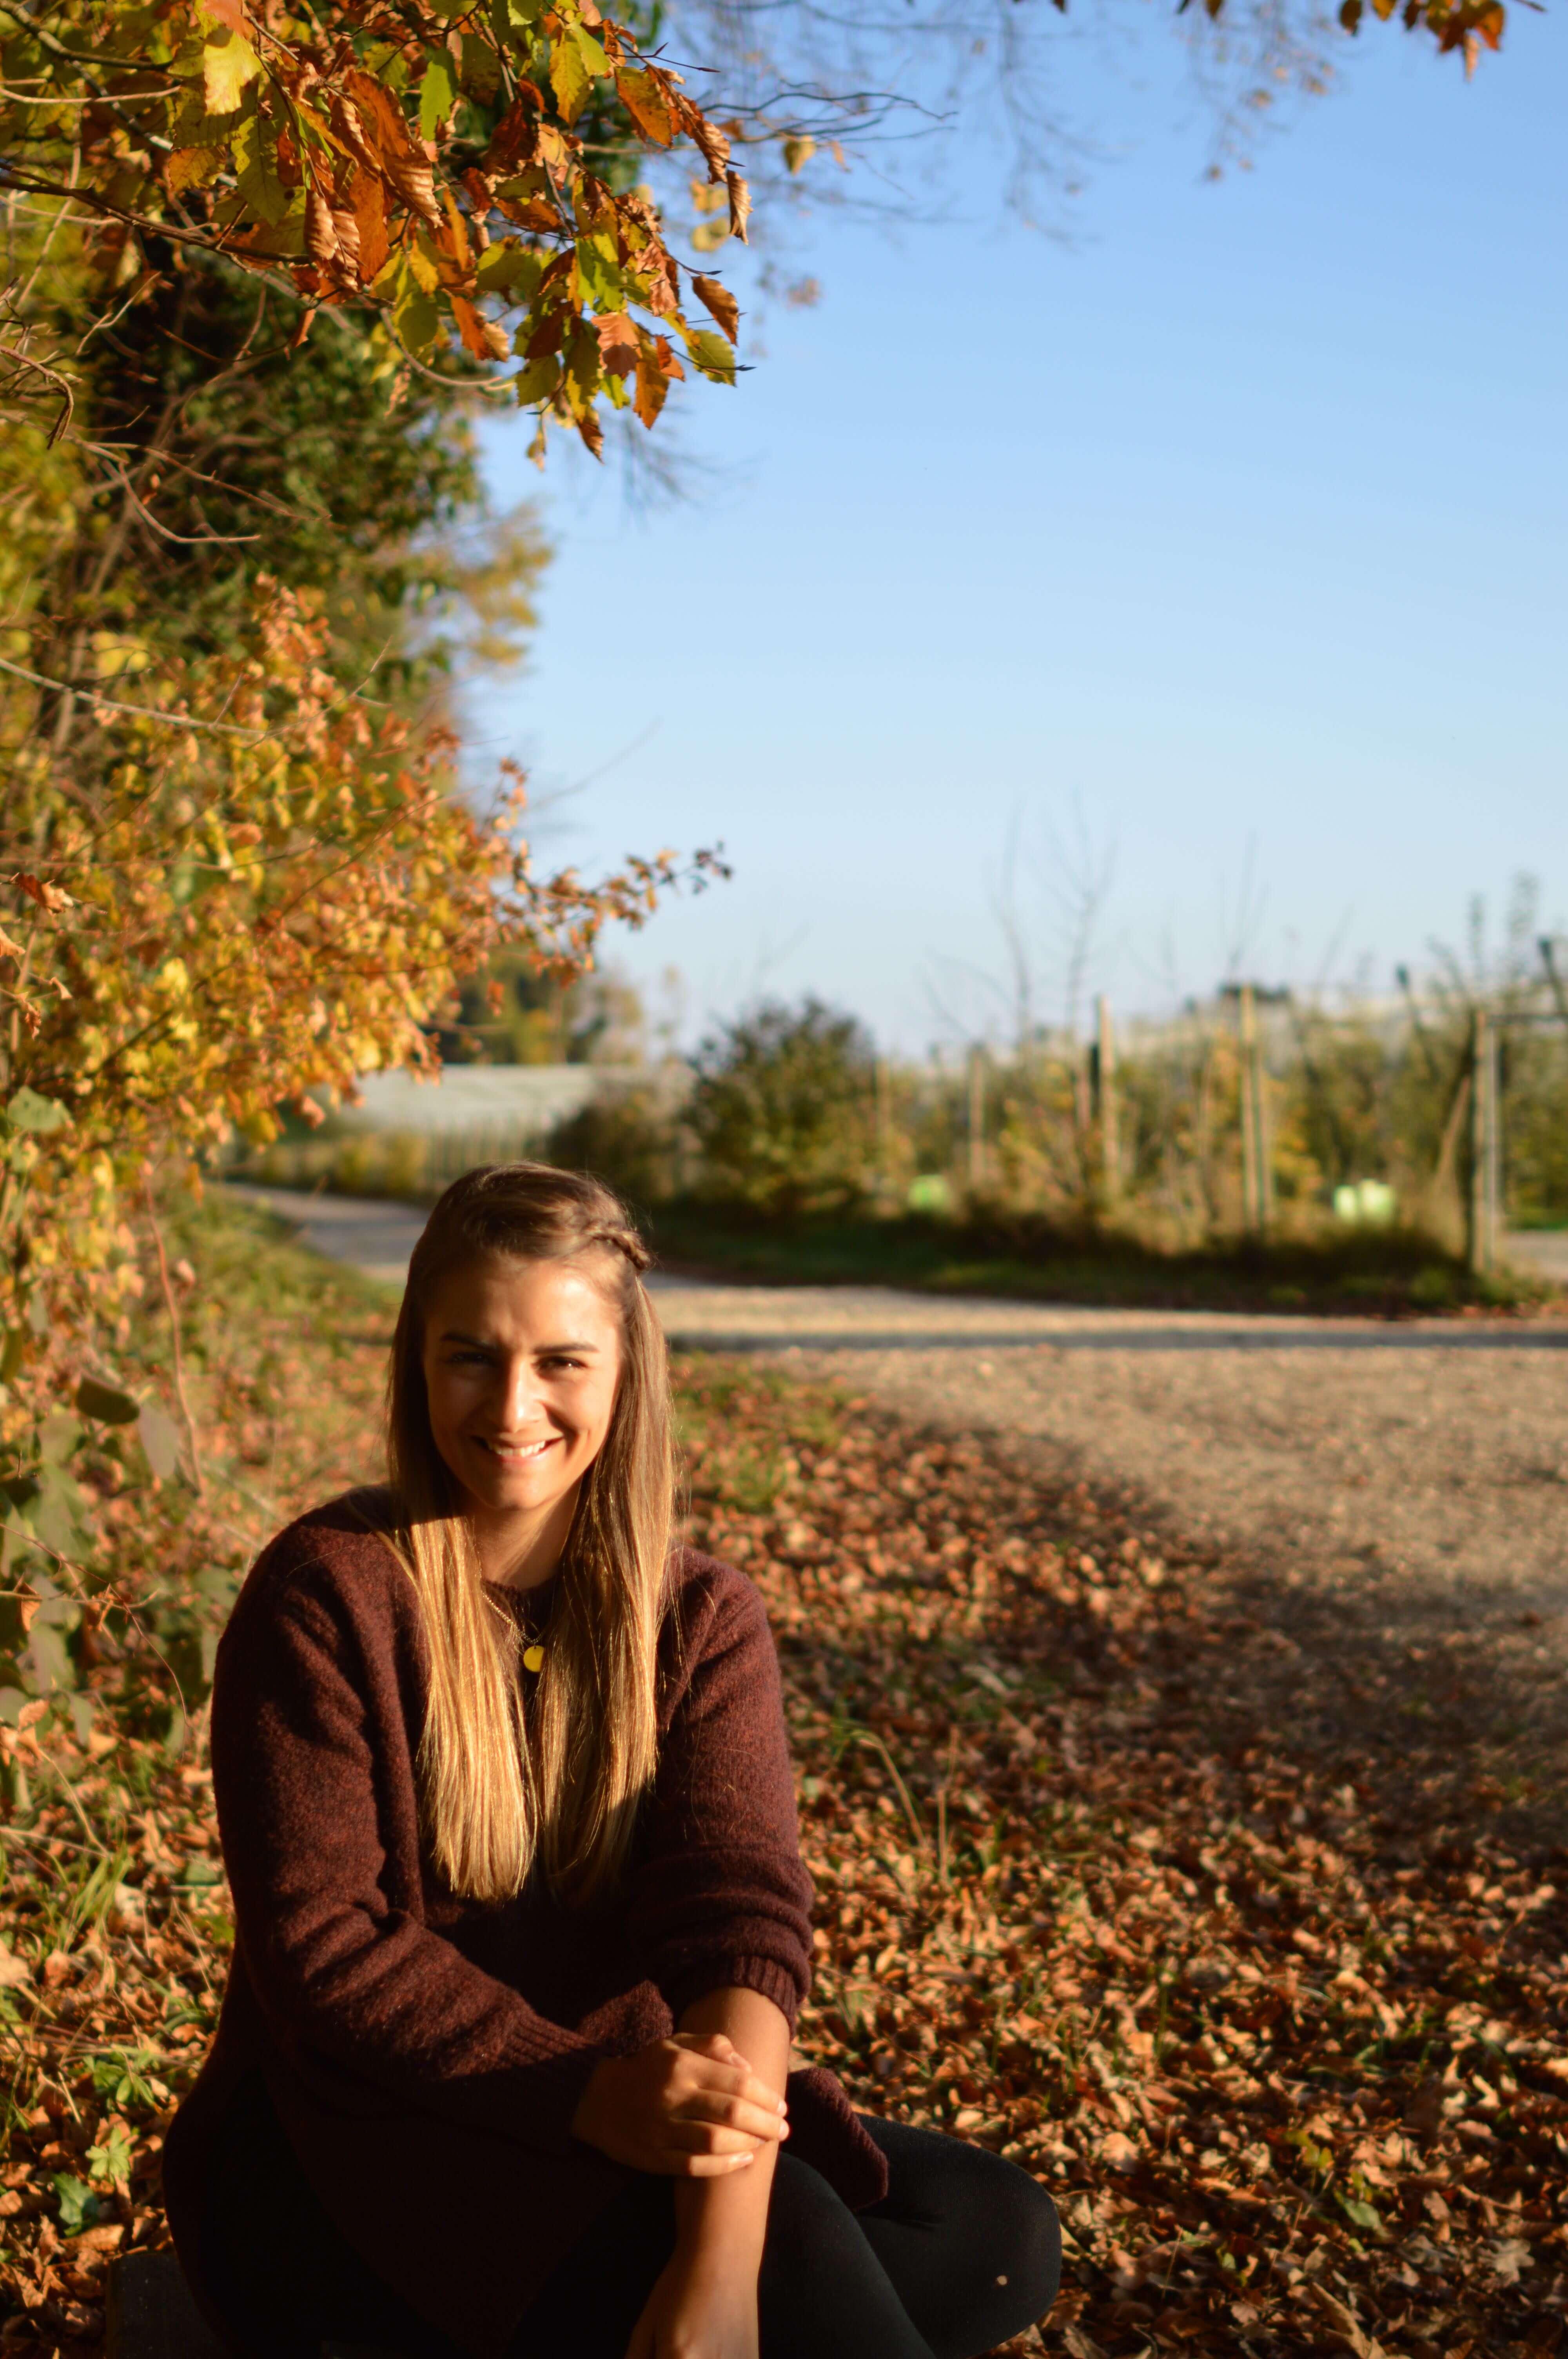 Blaetter-Laub-Herbst